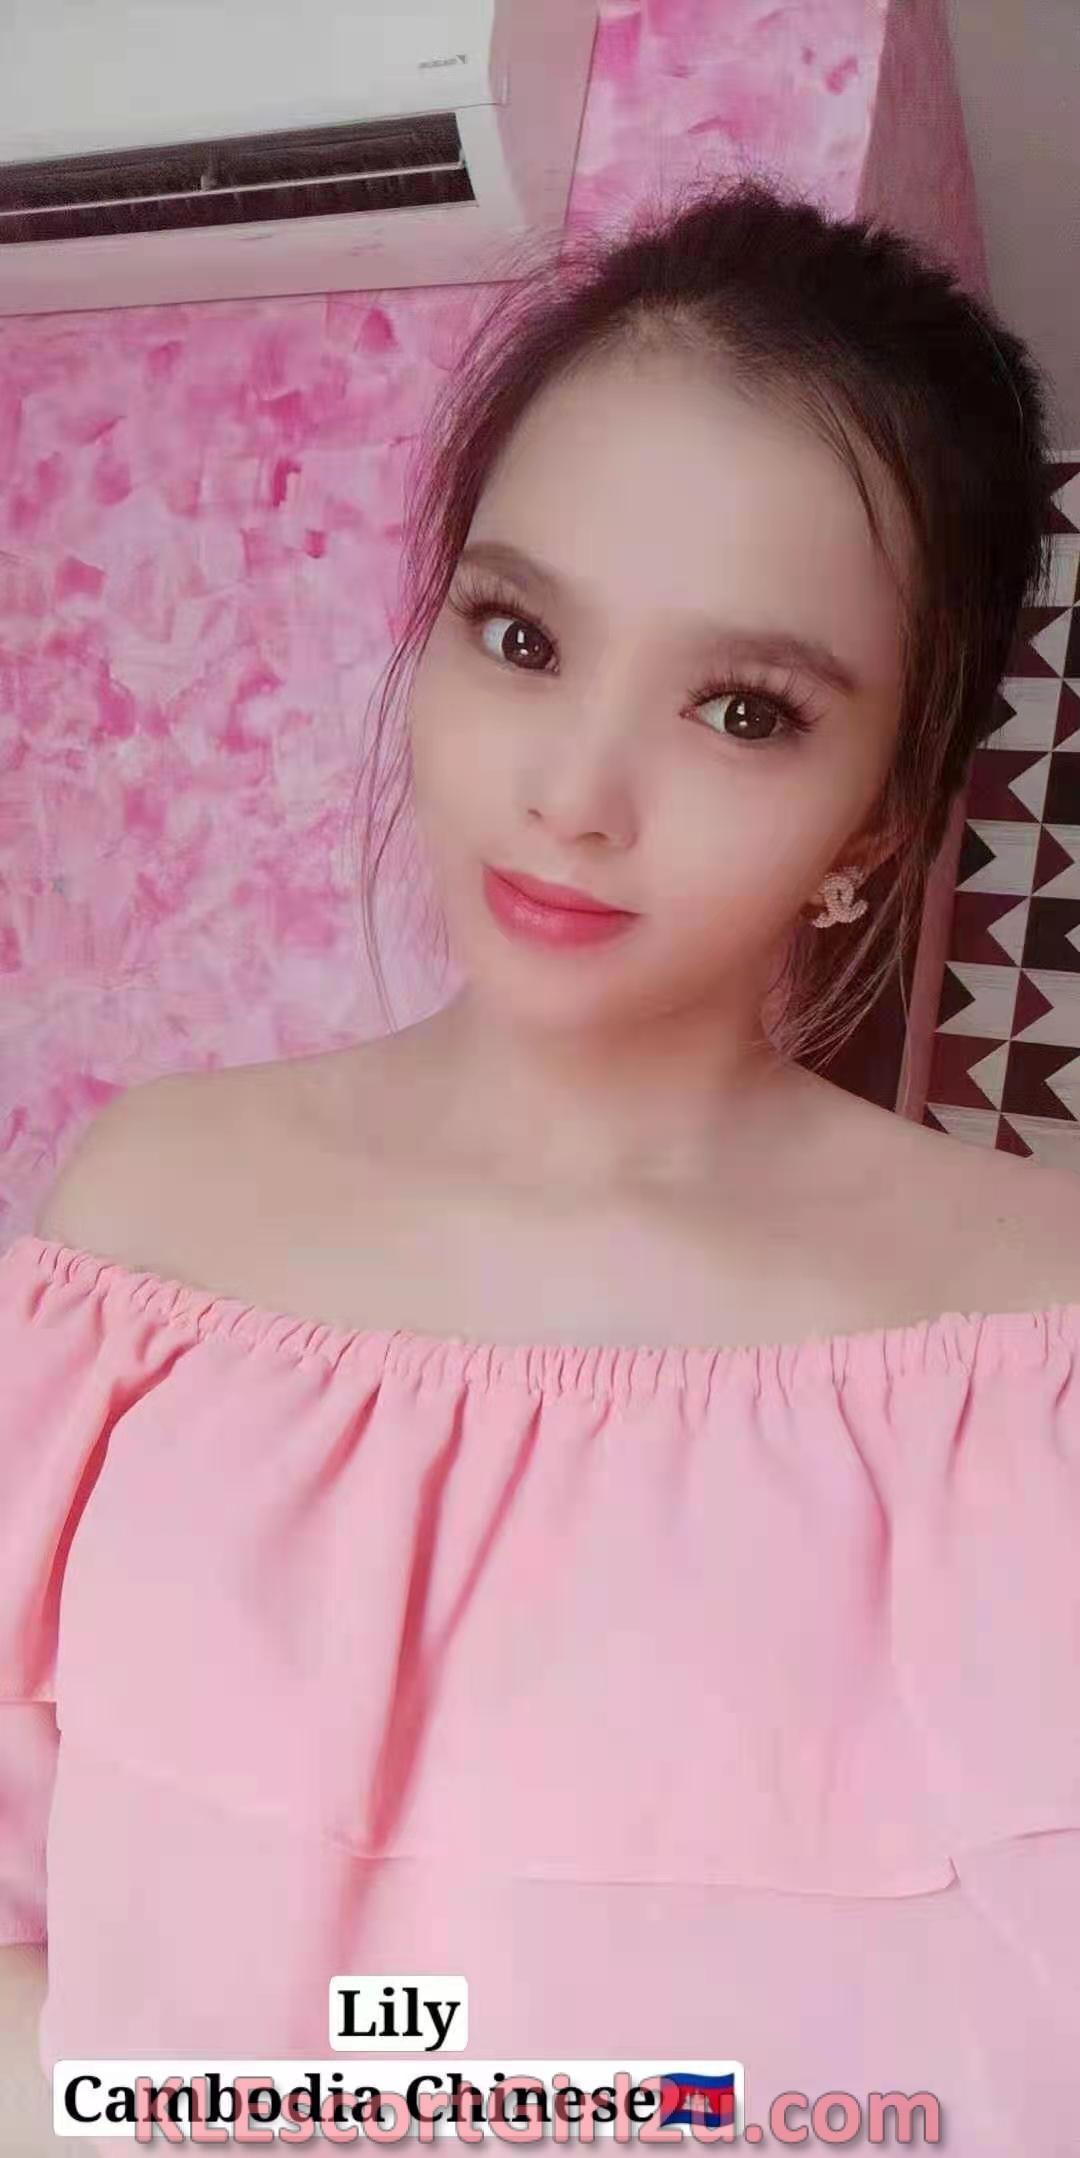 Kl Escort - Cambodia - Lily